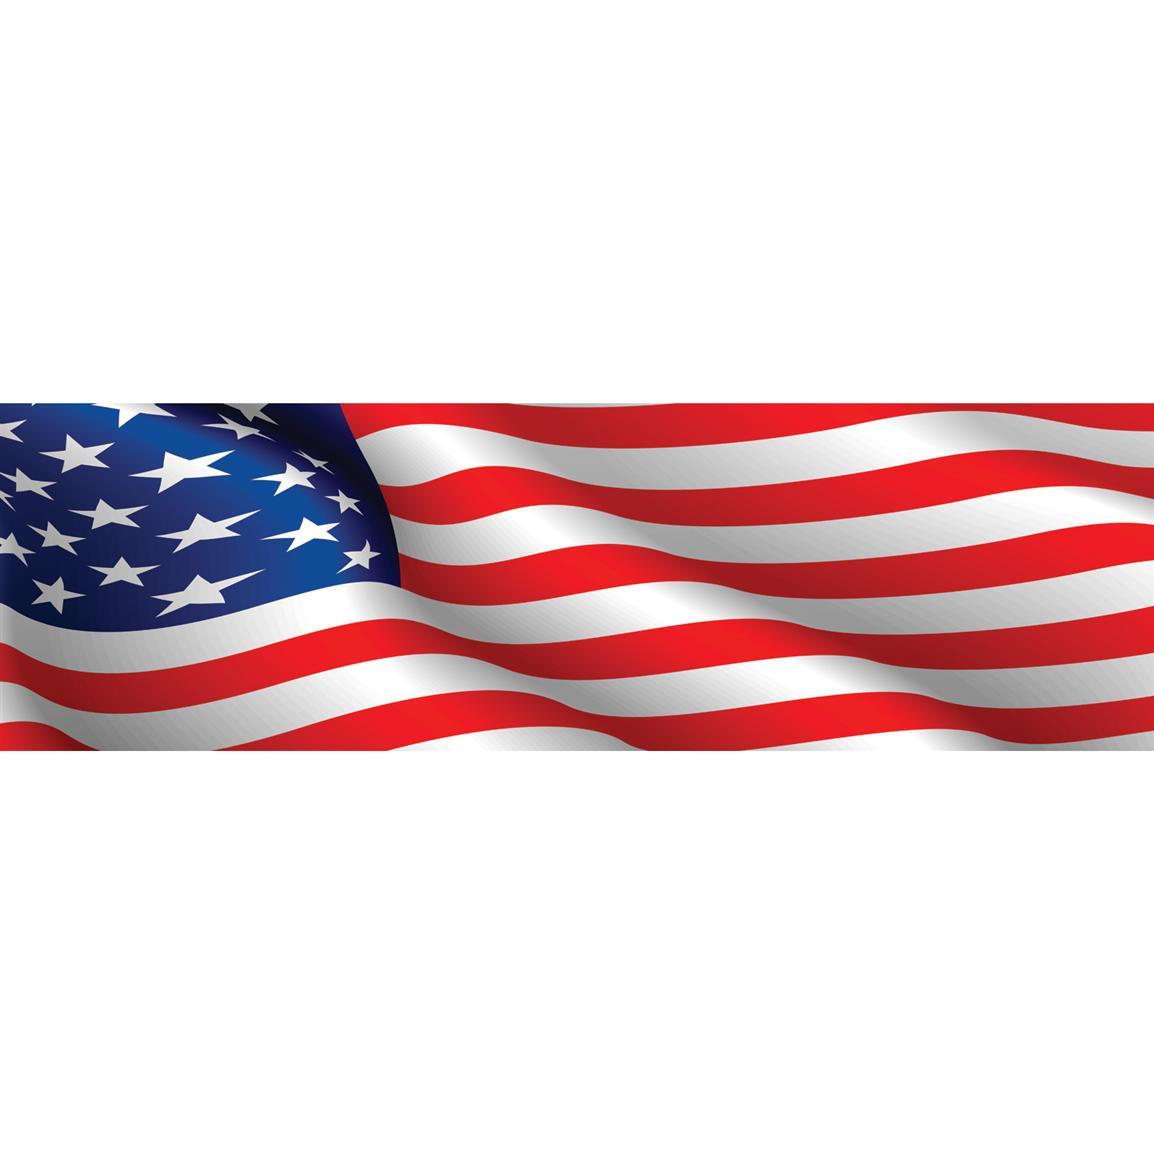 1154x1154 American Flag Graphic Free Download Clip Art Free Clip Art